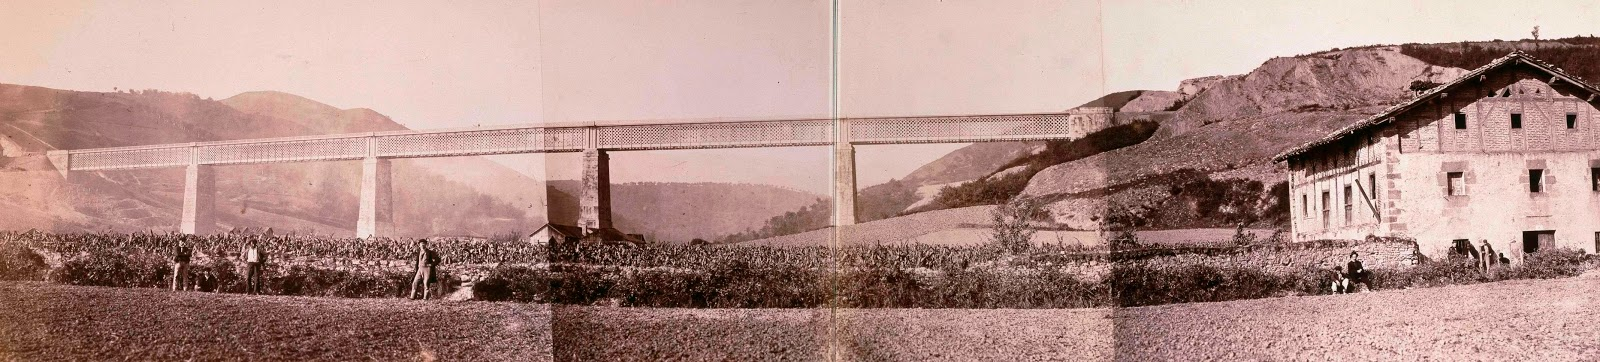 0. Vista del viaducto de Ormaiztegi tomada en 1864 por el francés Jean Laurent. Archivo de la Biblioteca Nacional. Ministerio de Cultura via blog Historias del tren